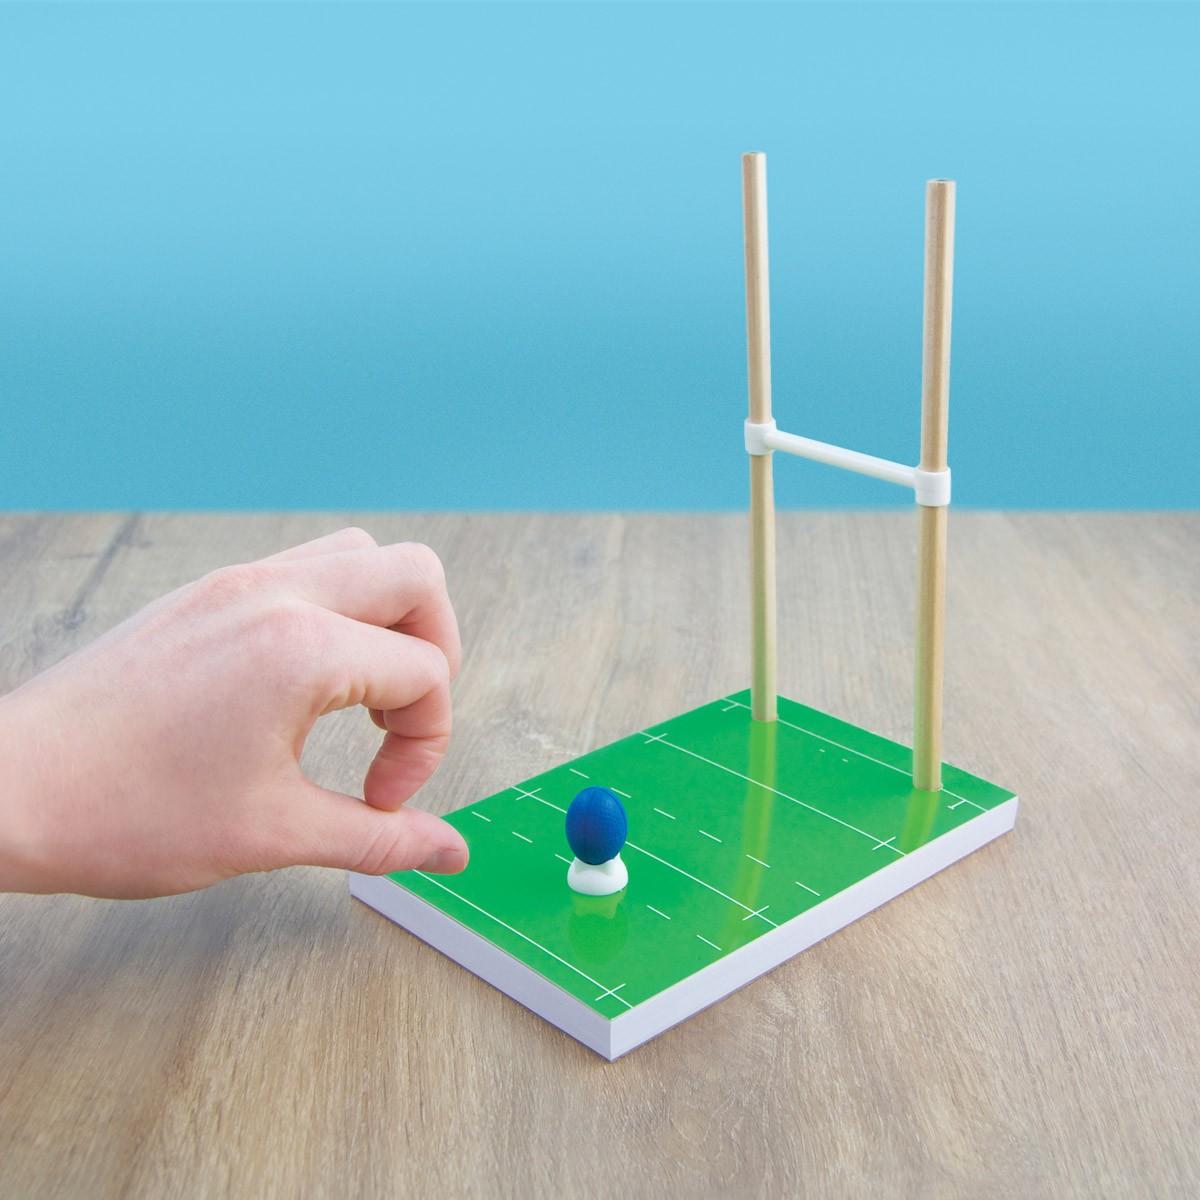 set de bureau en forme de mini jeu de rugby sur logeekdesign. Black Bedroom Furniture Sets. Home Design Ideas